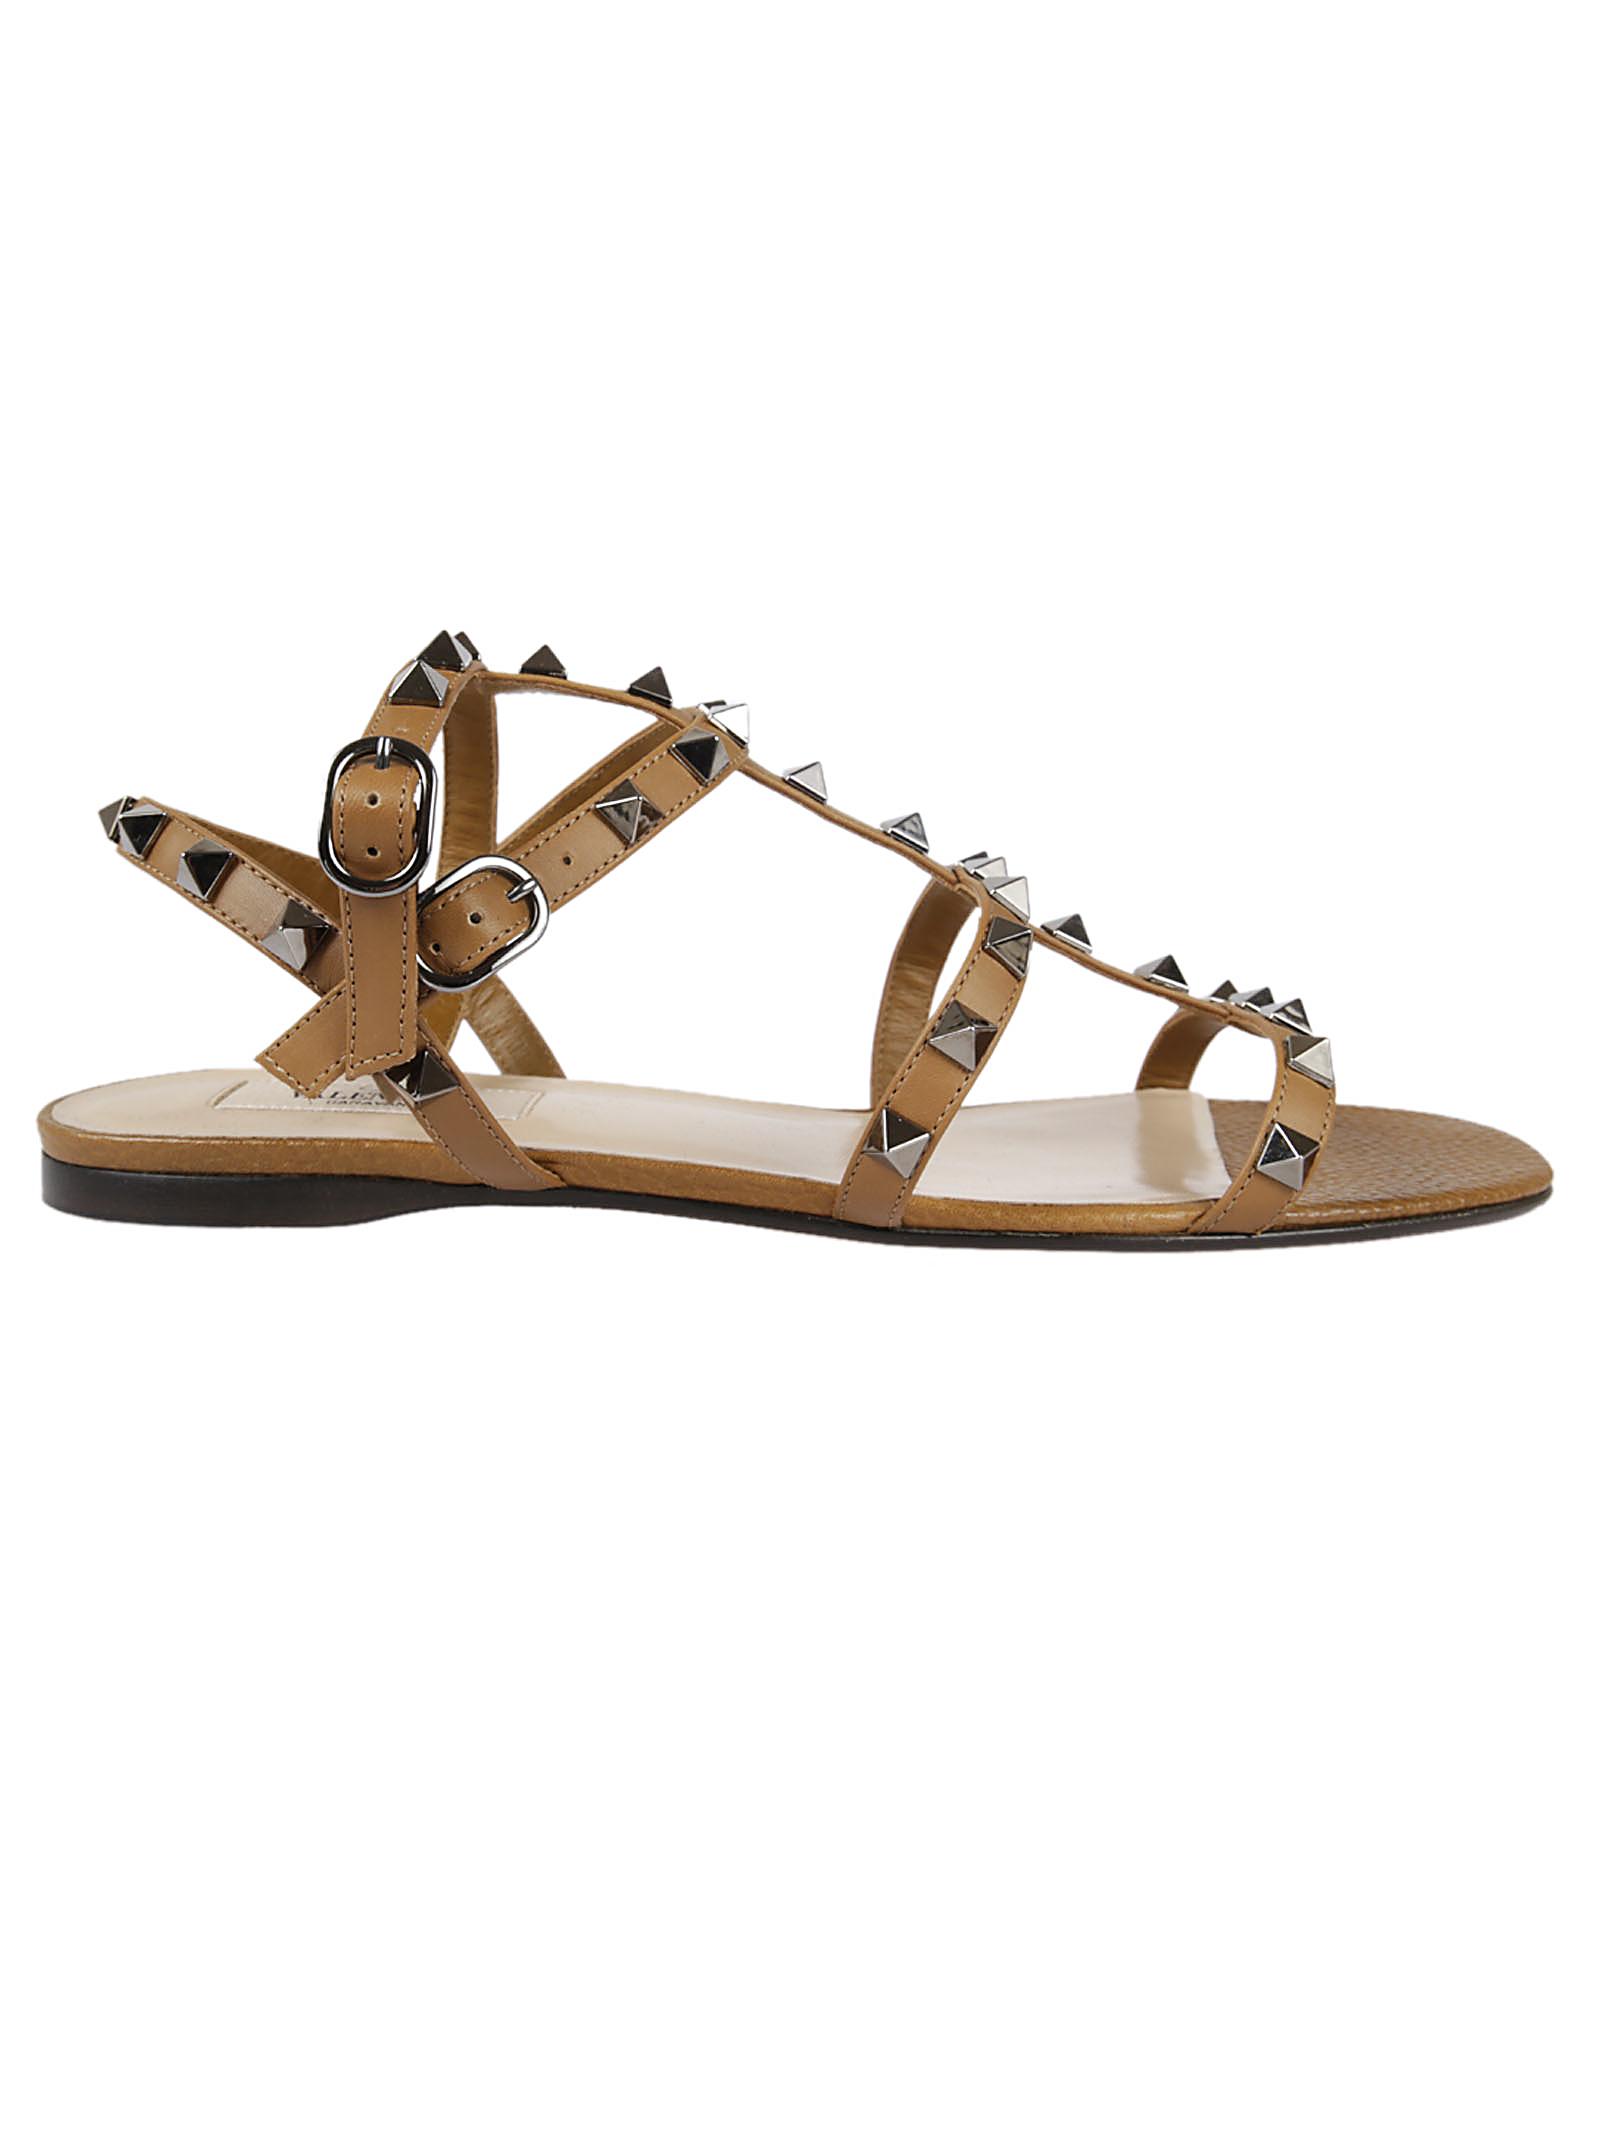 Valentino Garavani Valentino Garavani Rockstud Flat Sandals